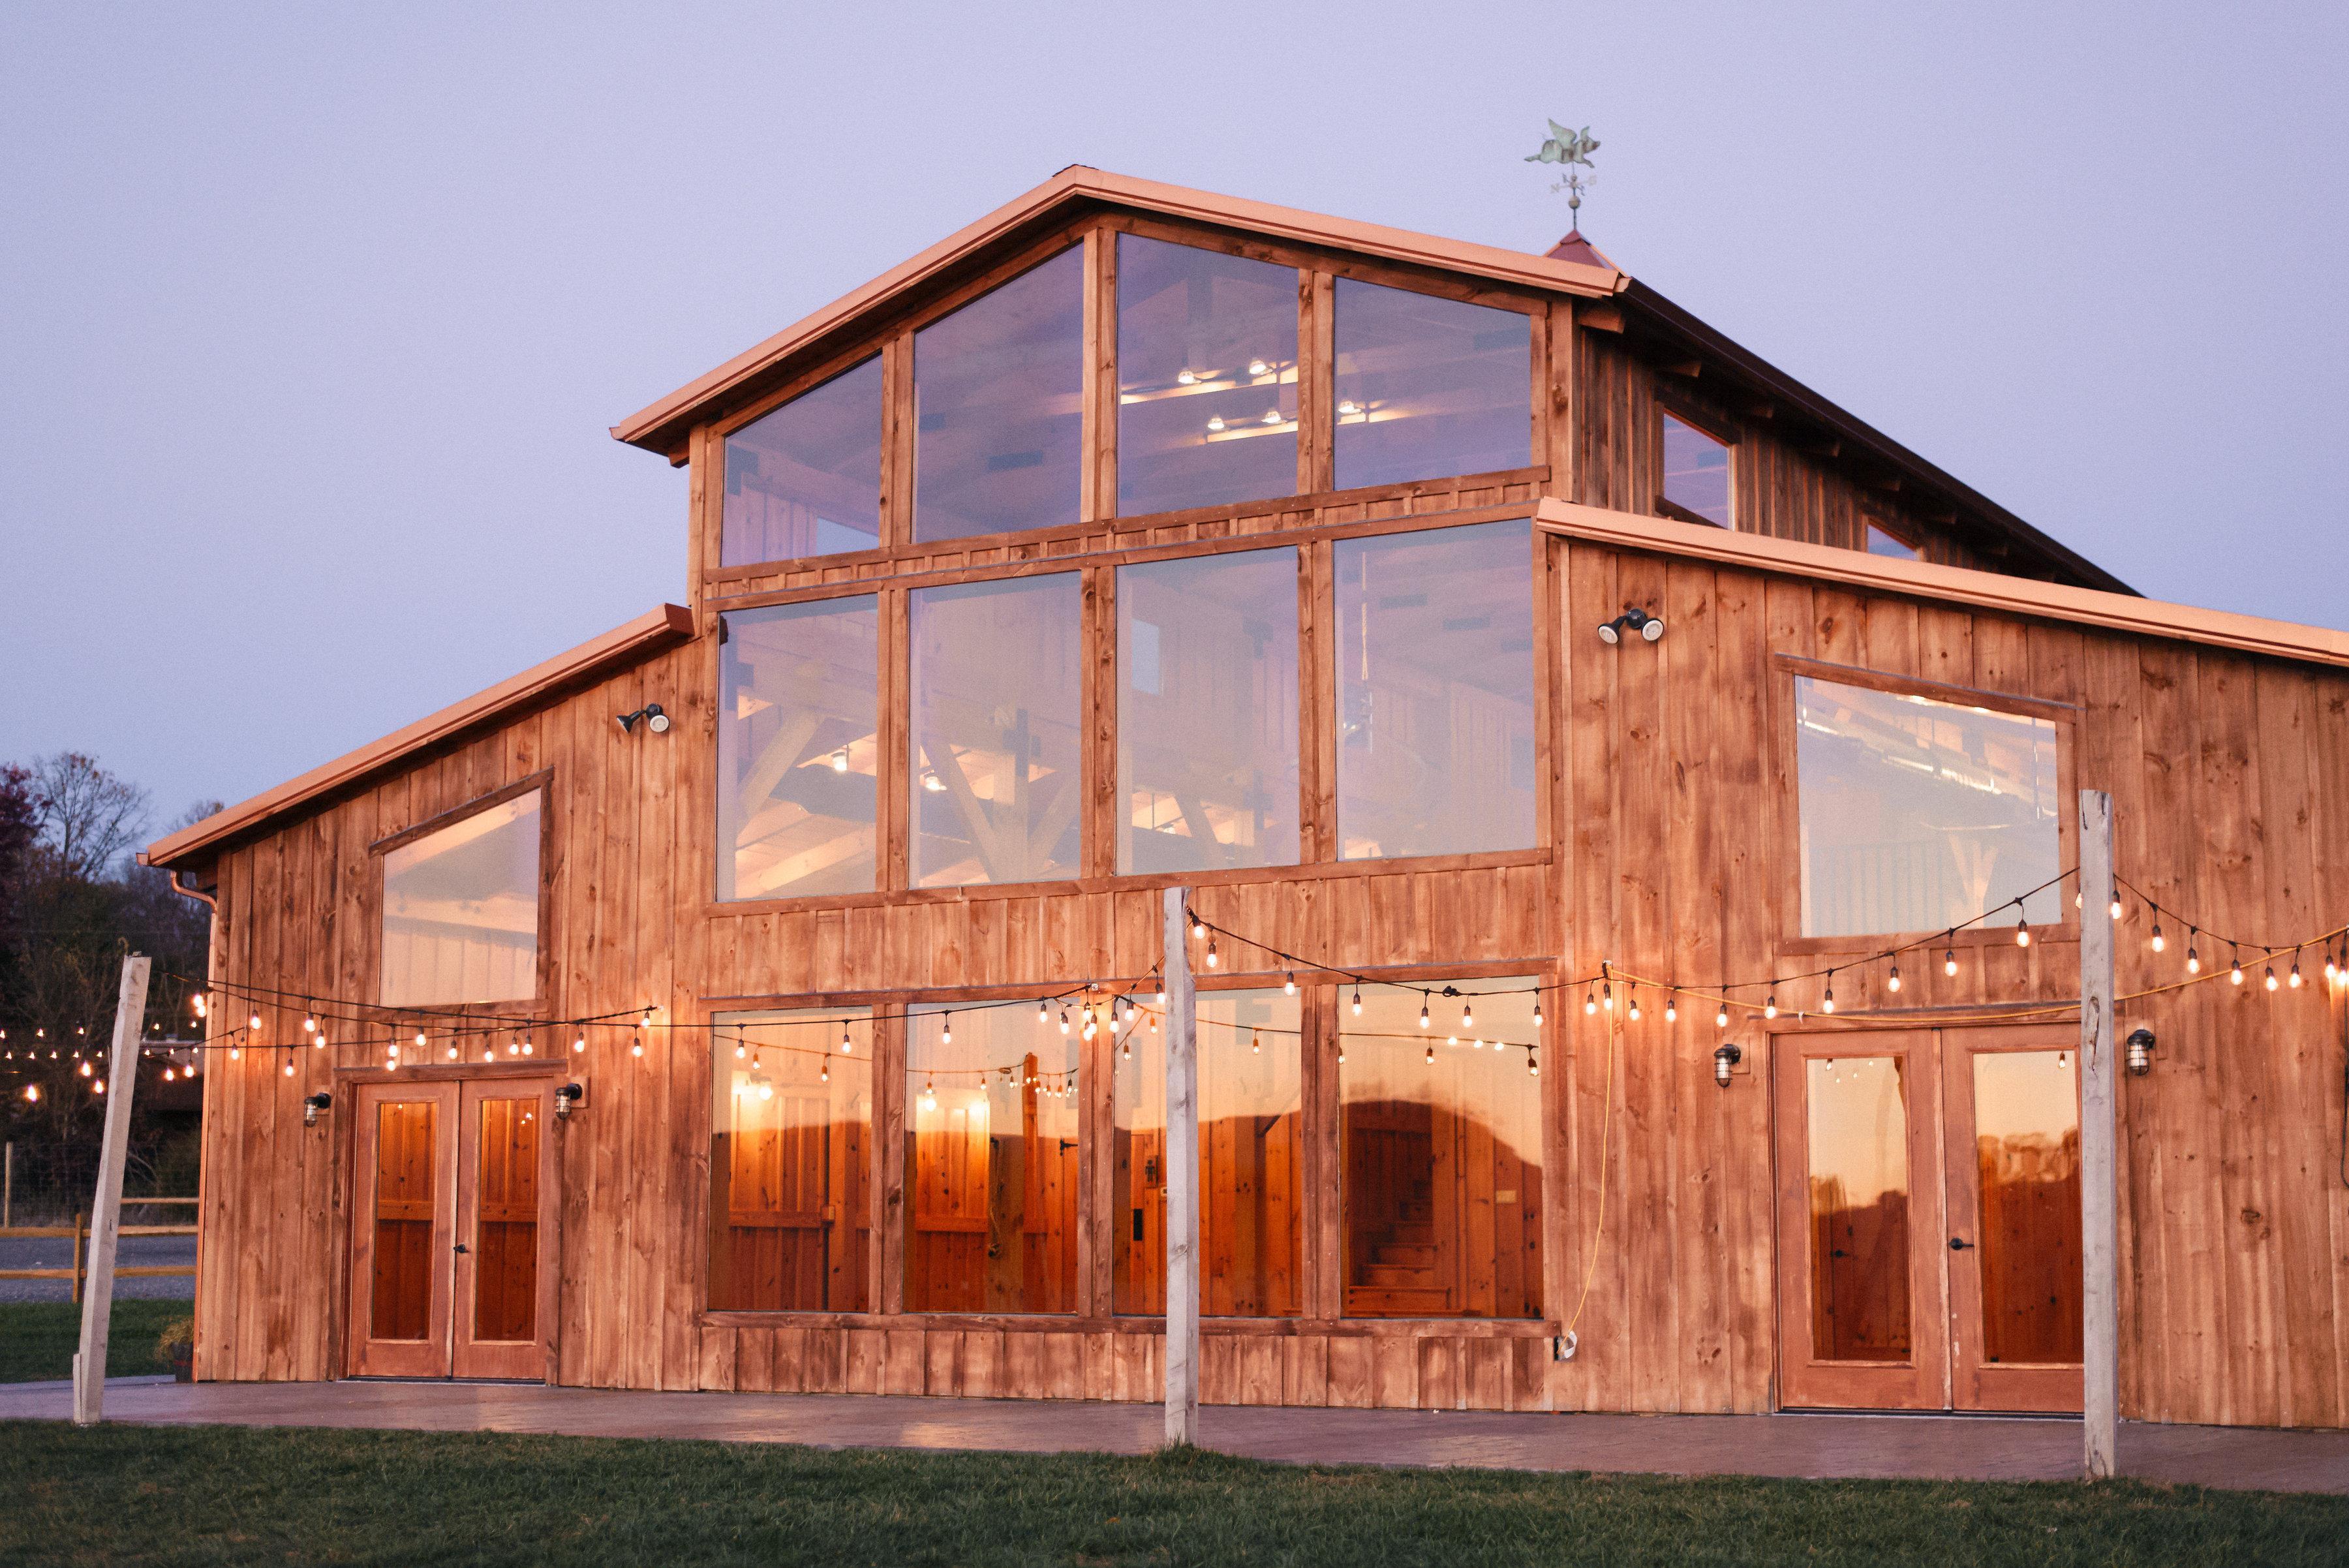 Faithbrooke Vineyards Venue face